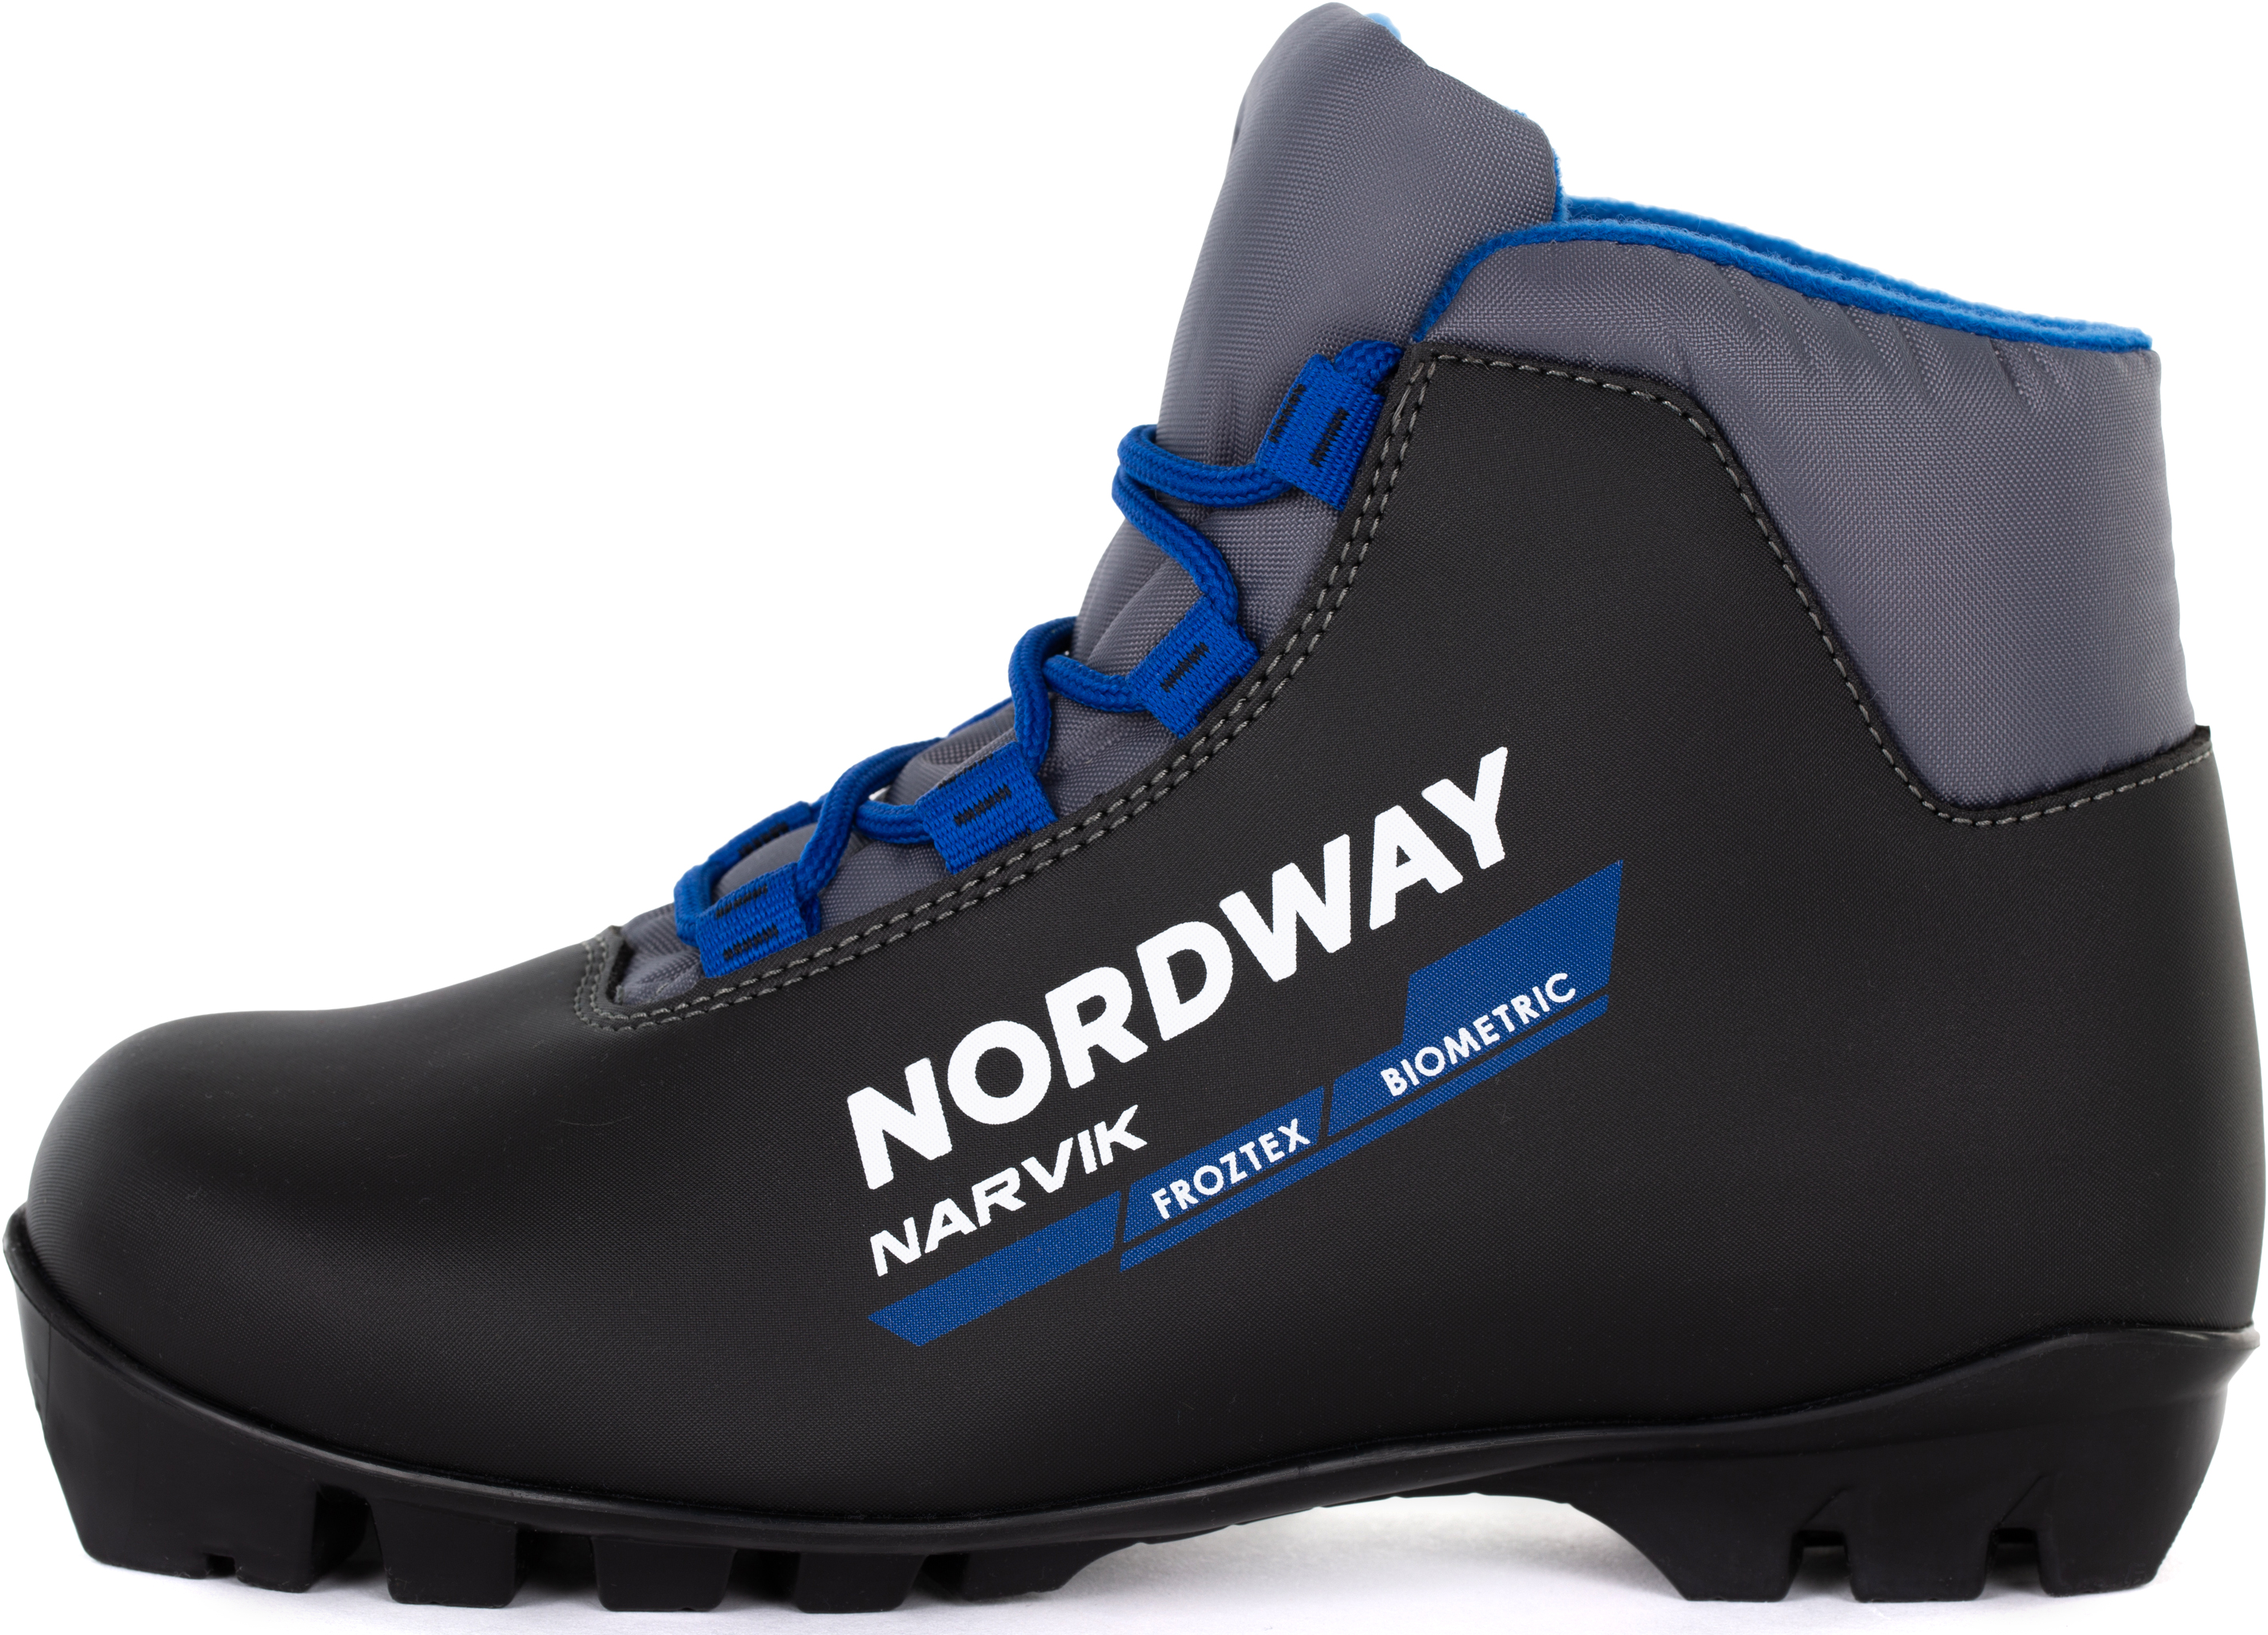 Nordway Ботинки для беговых лыж детские Nordway Narvik JR nordway nordway mimi 2016 детские